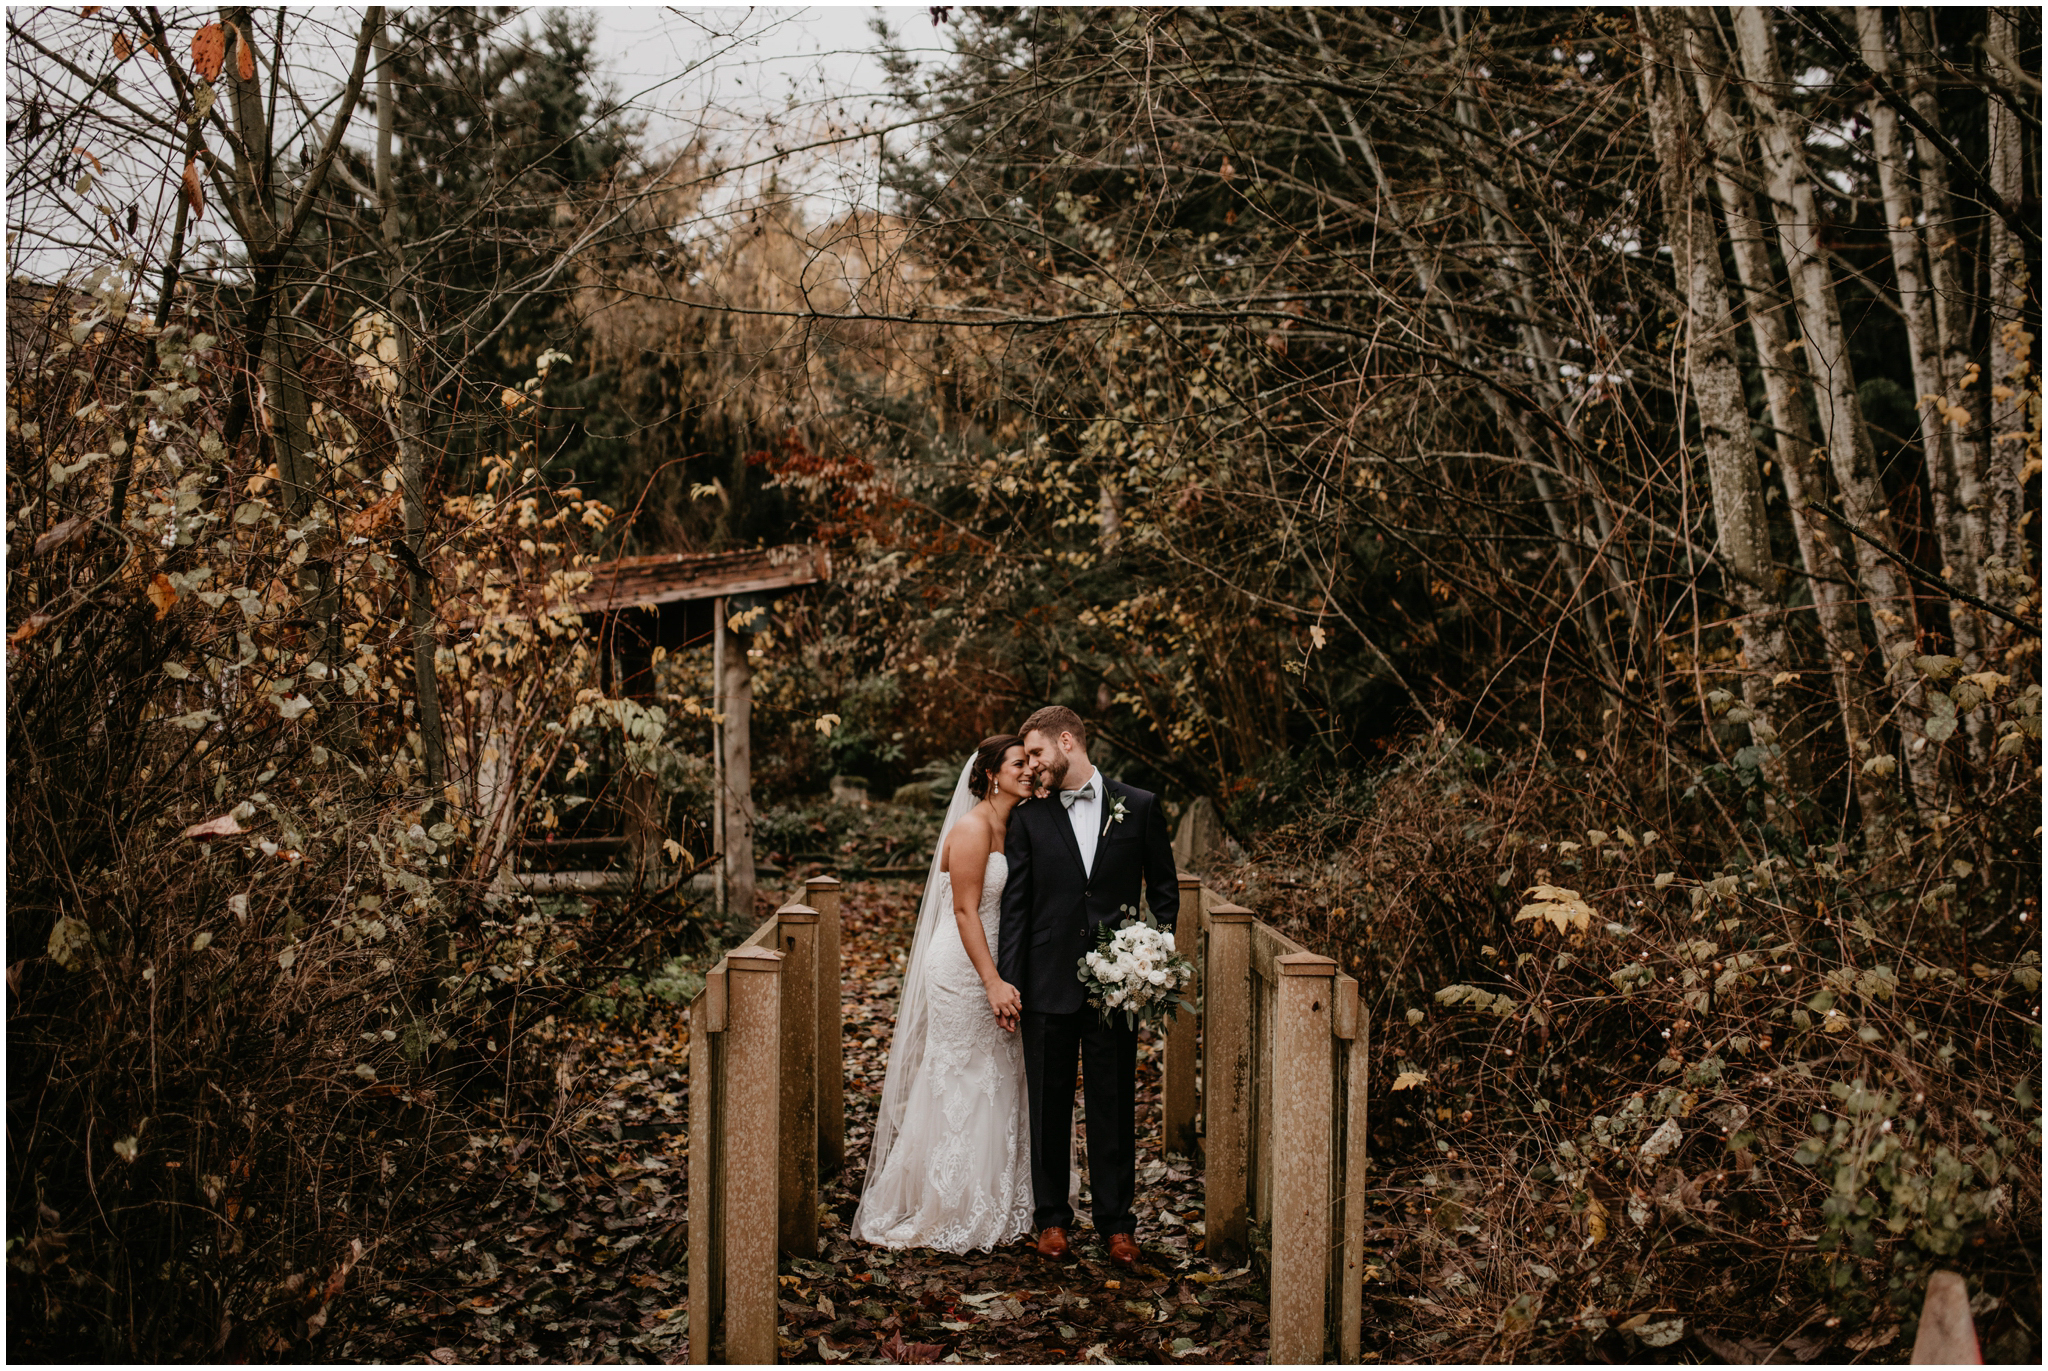 ashley-tj-the-pickering-barn-winter-wedding-seattle-photographer-052.jpg